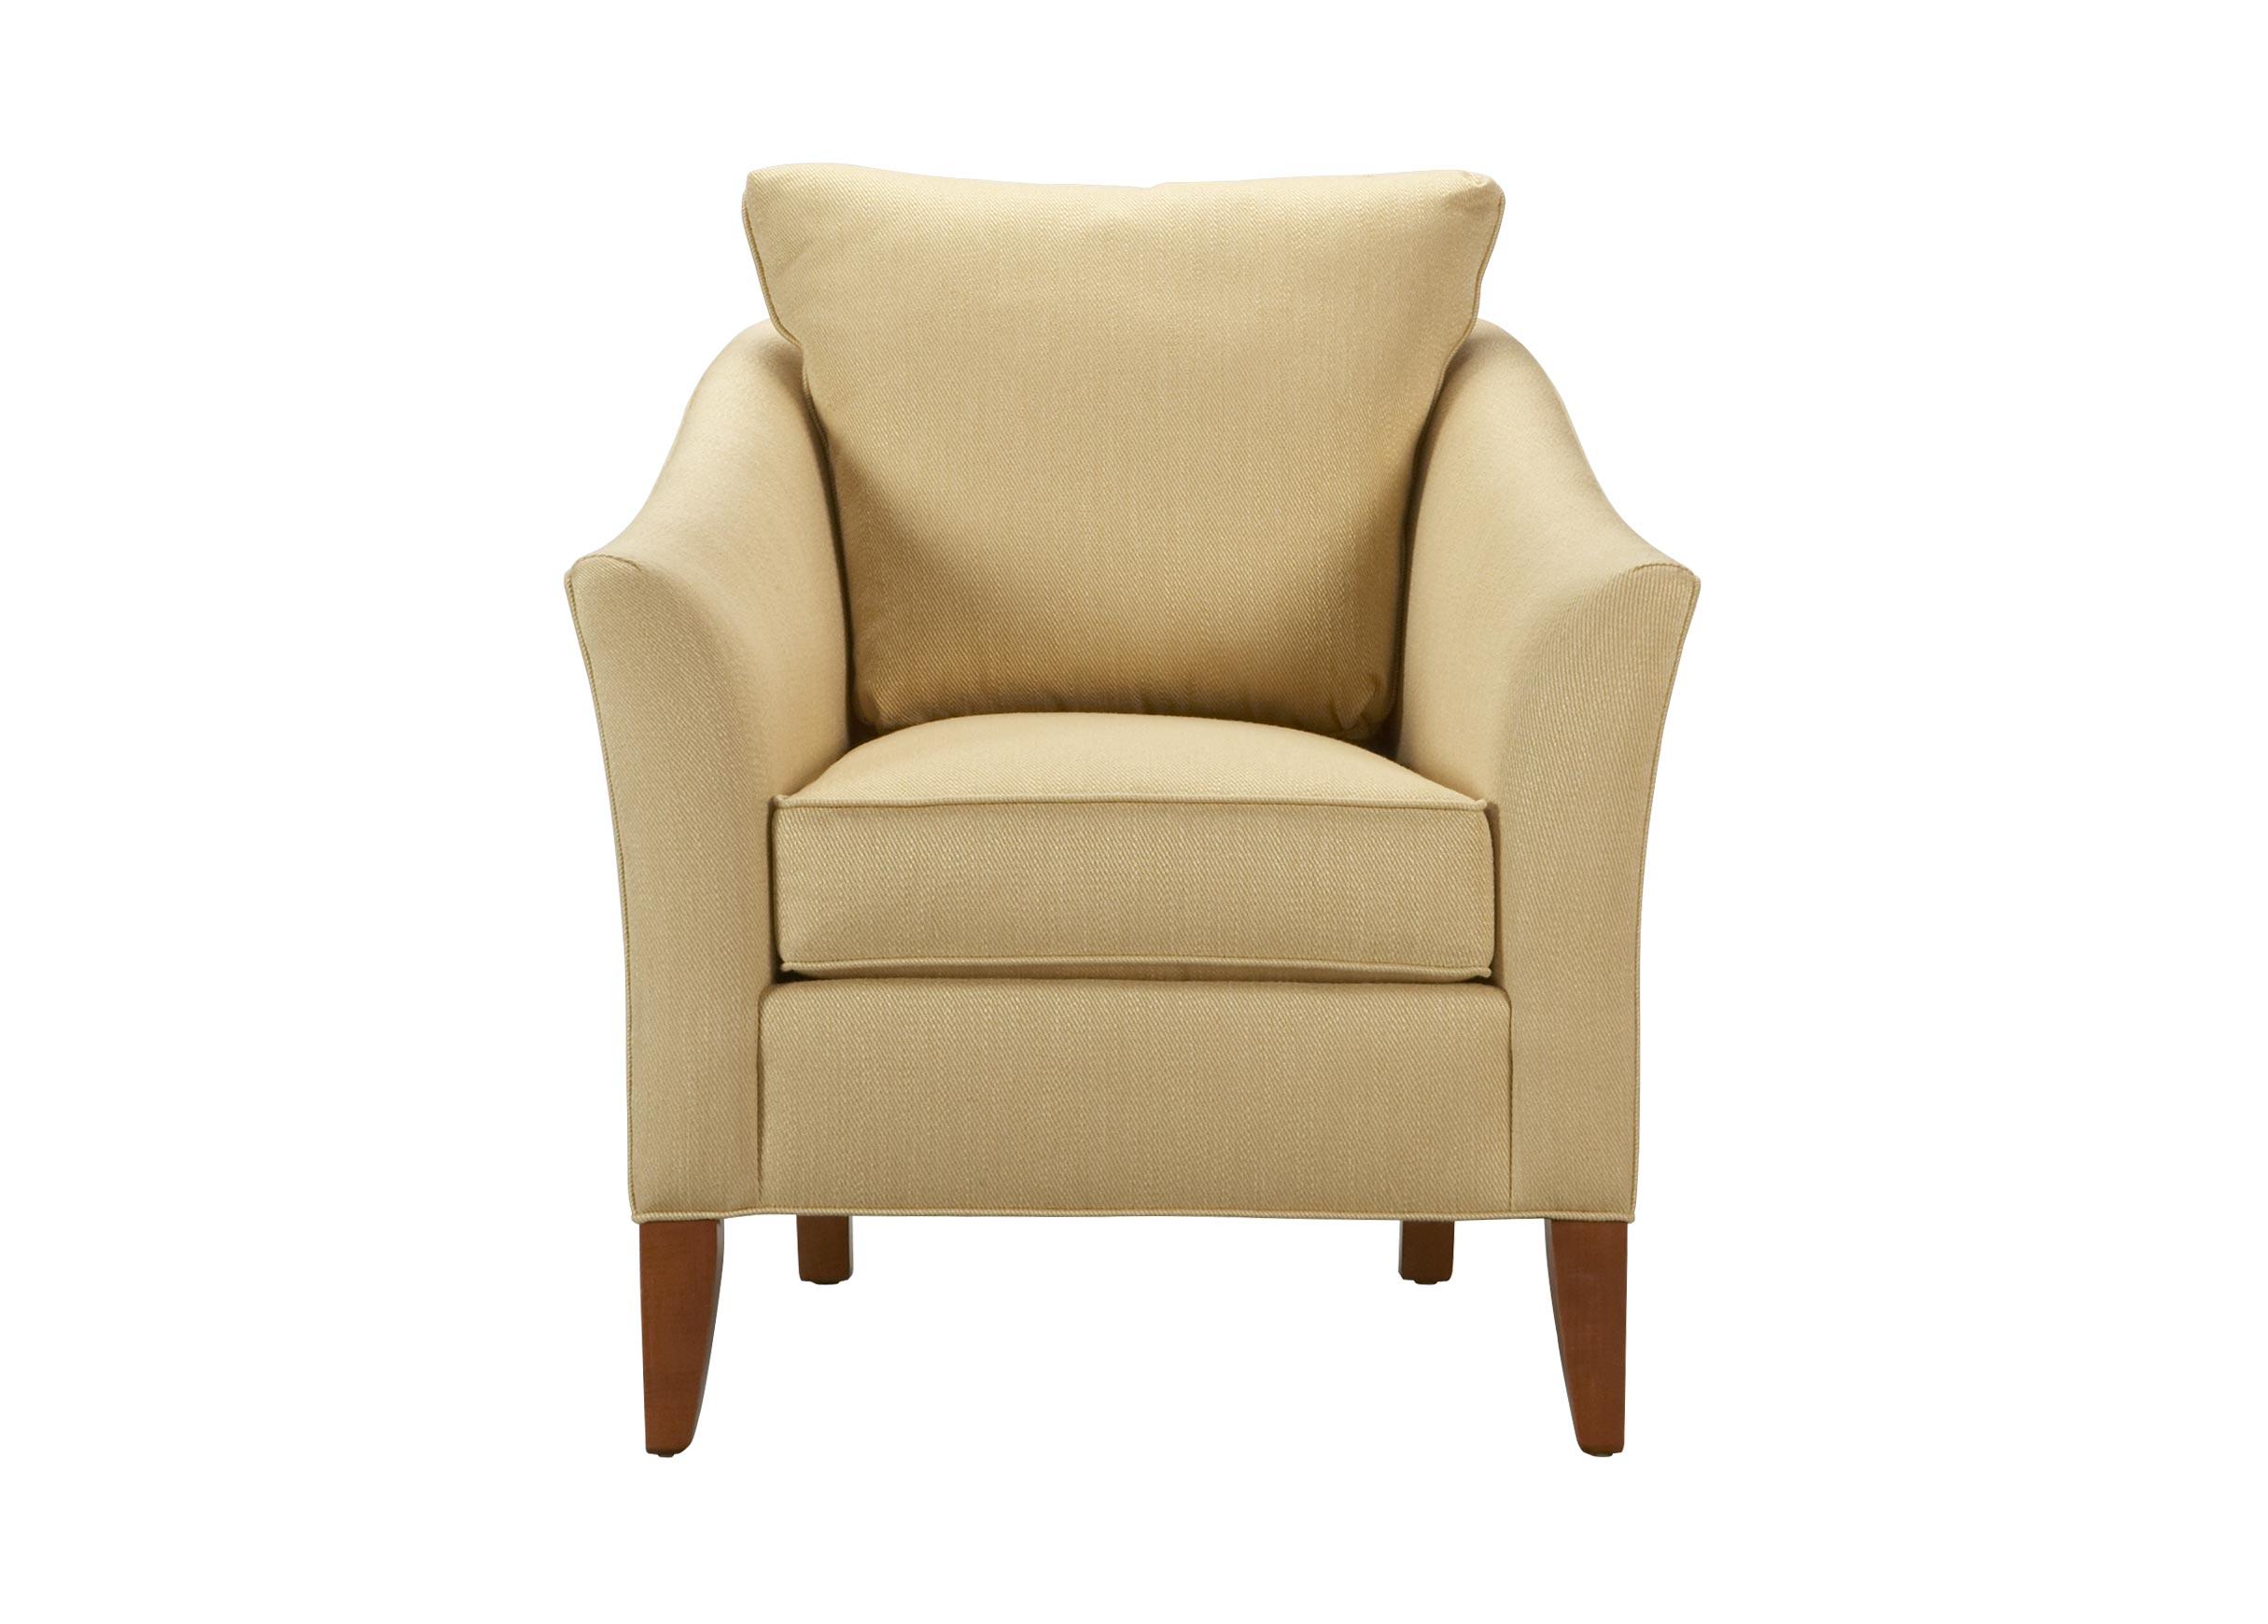 Gibson Chair Chairs Chaises Ethan Allen